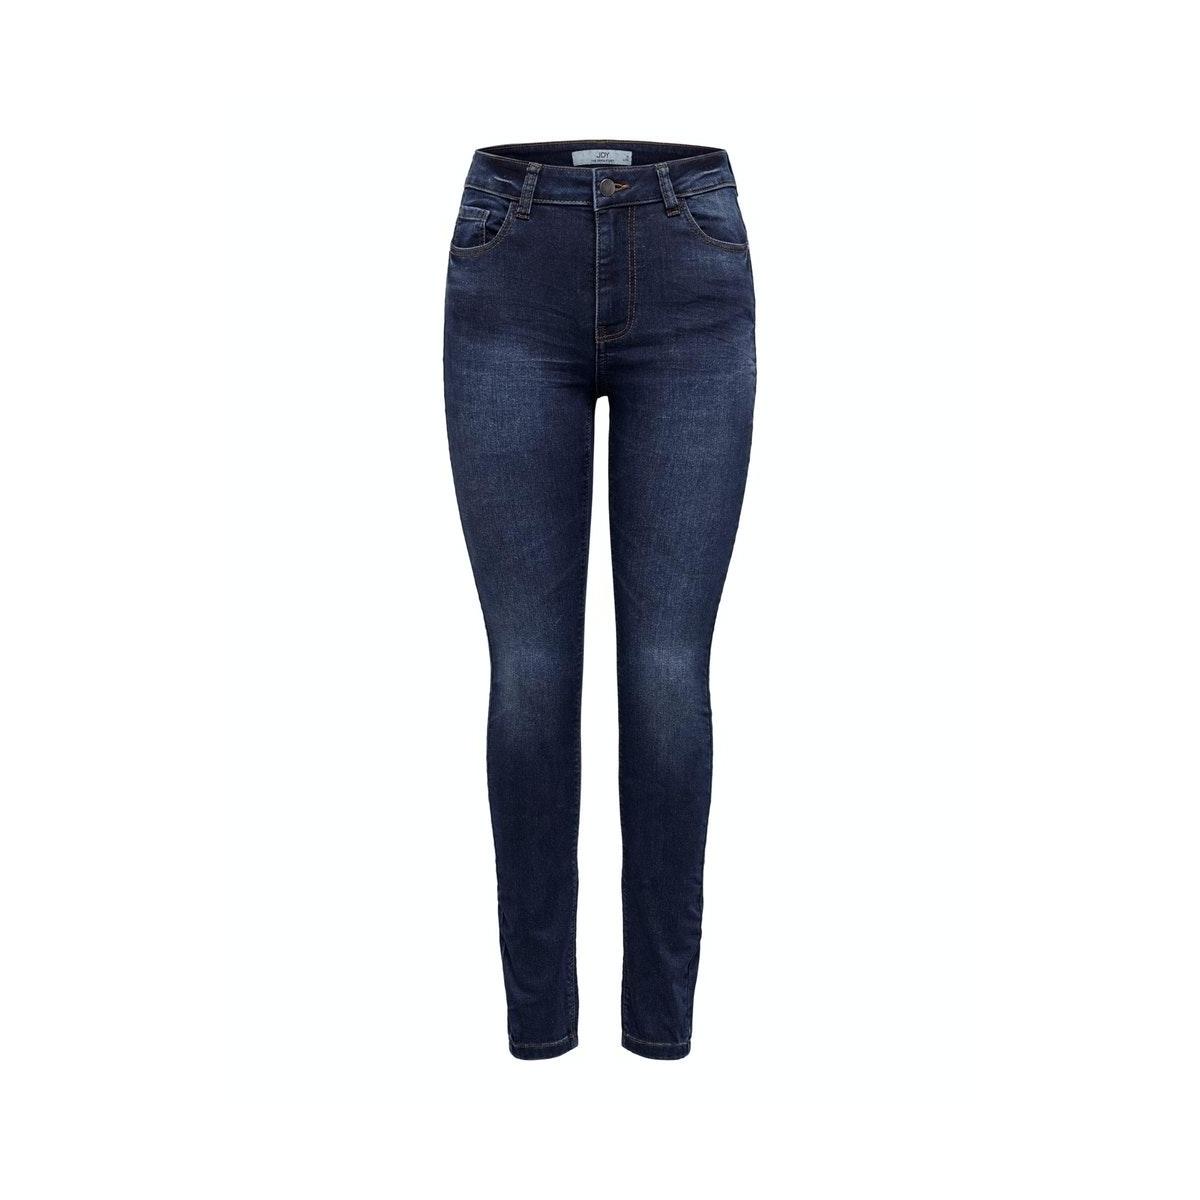 jdynewnikki life high skn md bl dnm 15208243 jacqueline de yong jeans medium blue denim